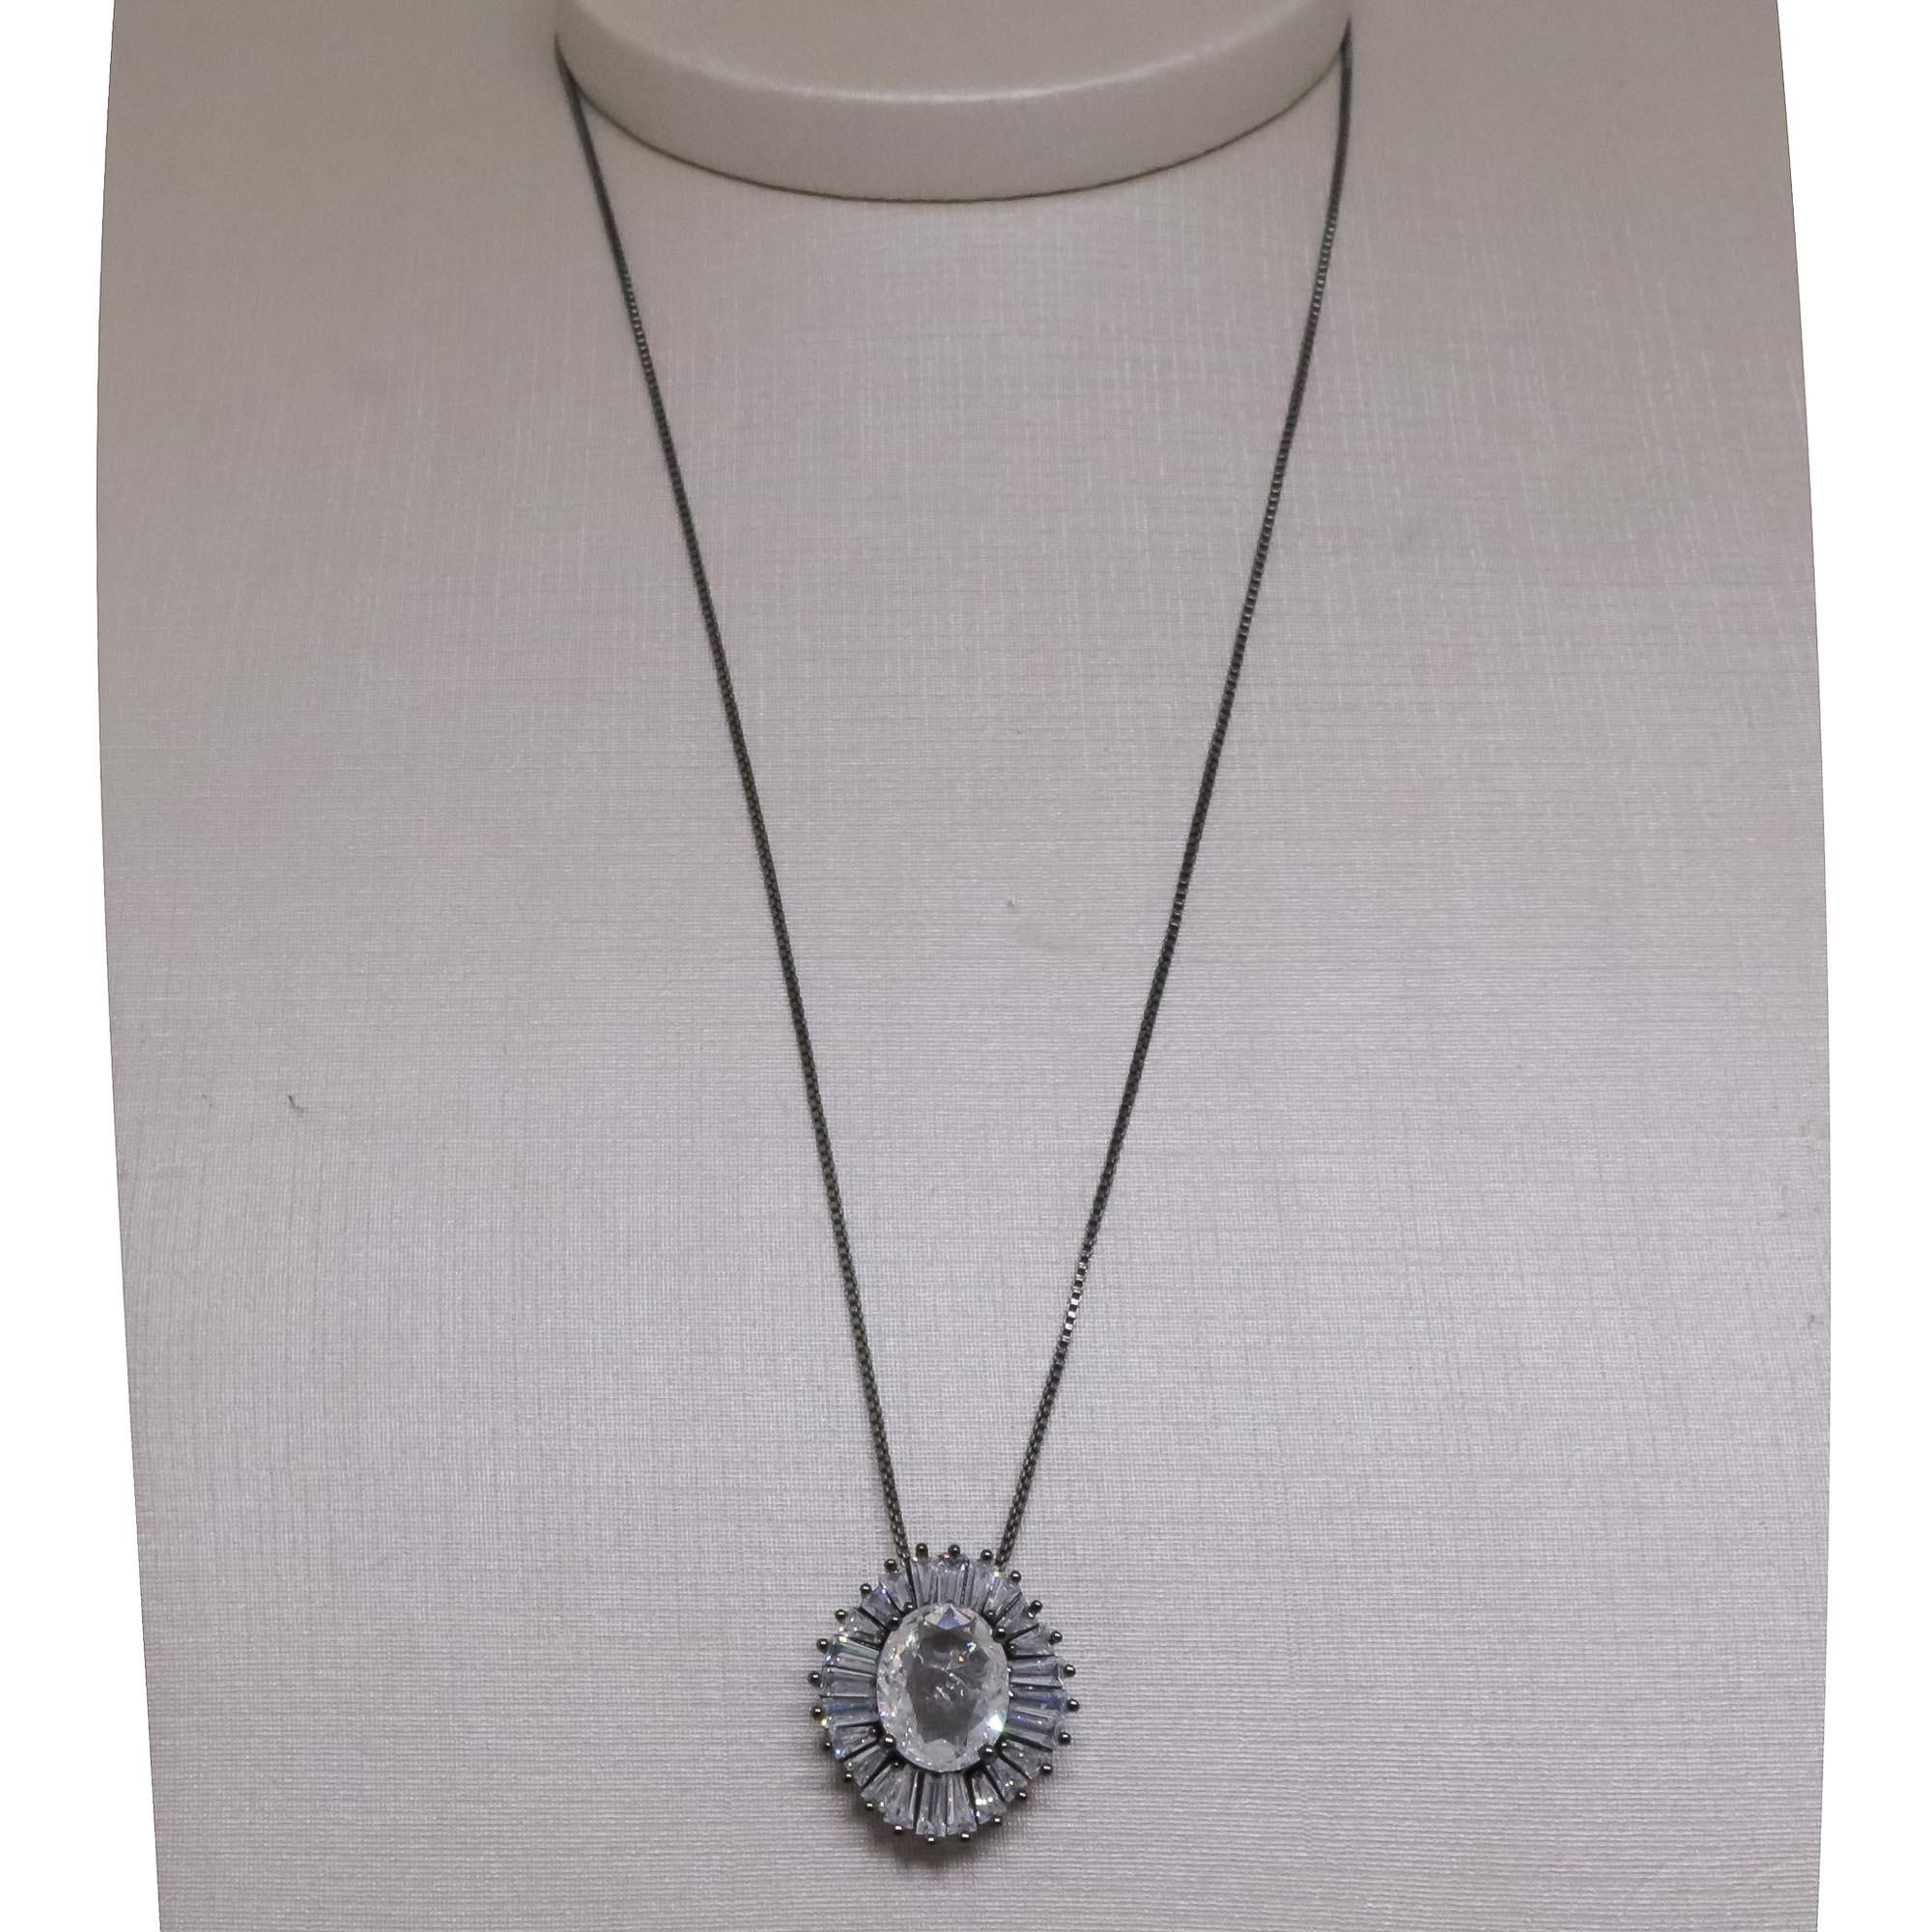 Gargantilha Semi joia  oval com zircônias Baguette banhada a ouro 18k ou rhodium